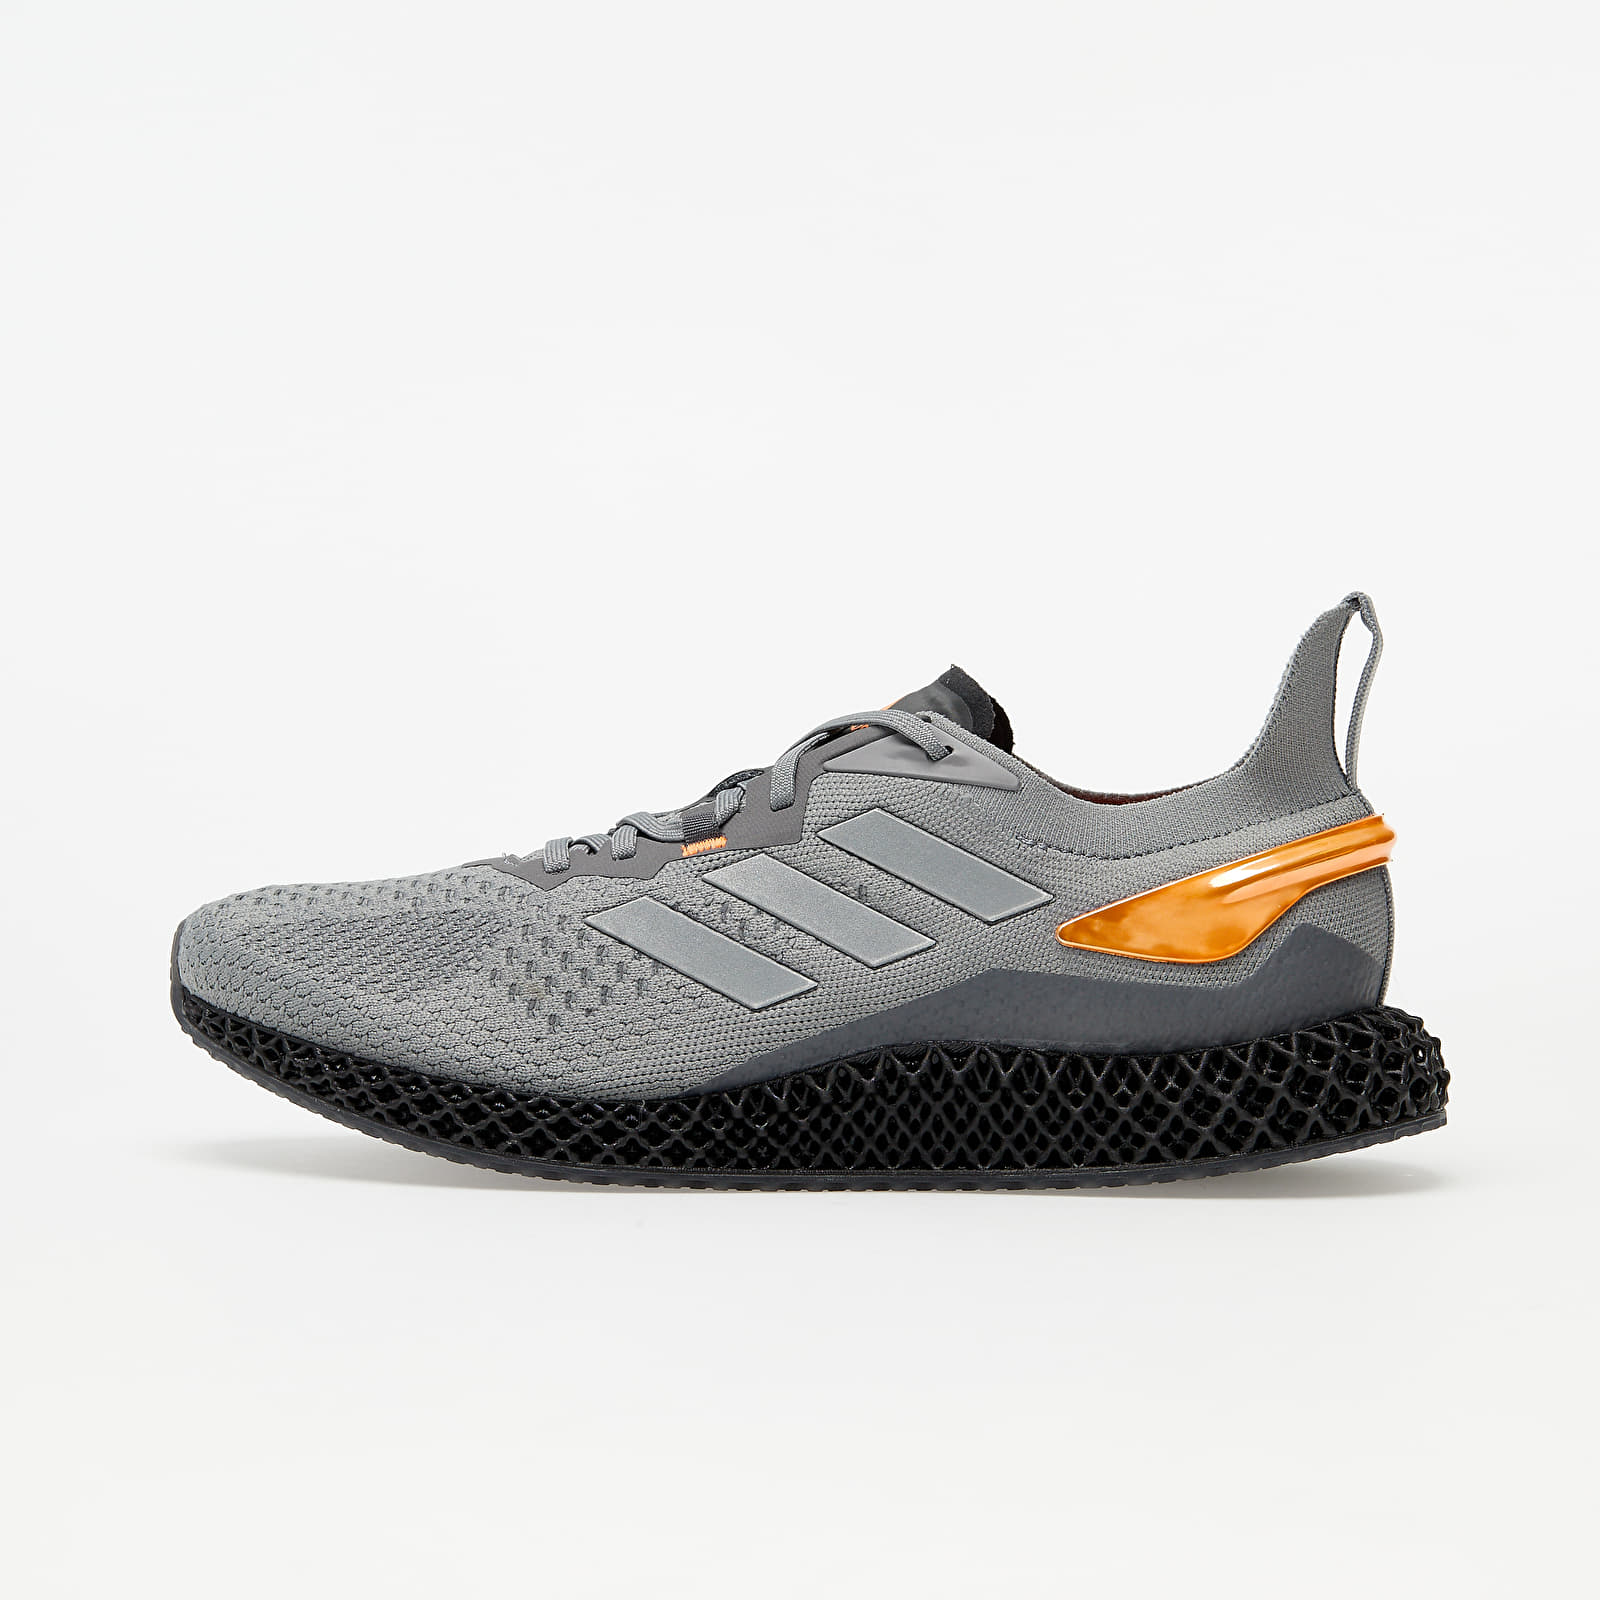 Chaussures et baskets homme adidas X90004D Grey Three/ Metalic Silver/ Signature Orange